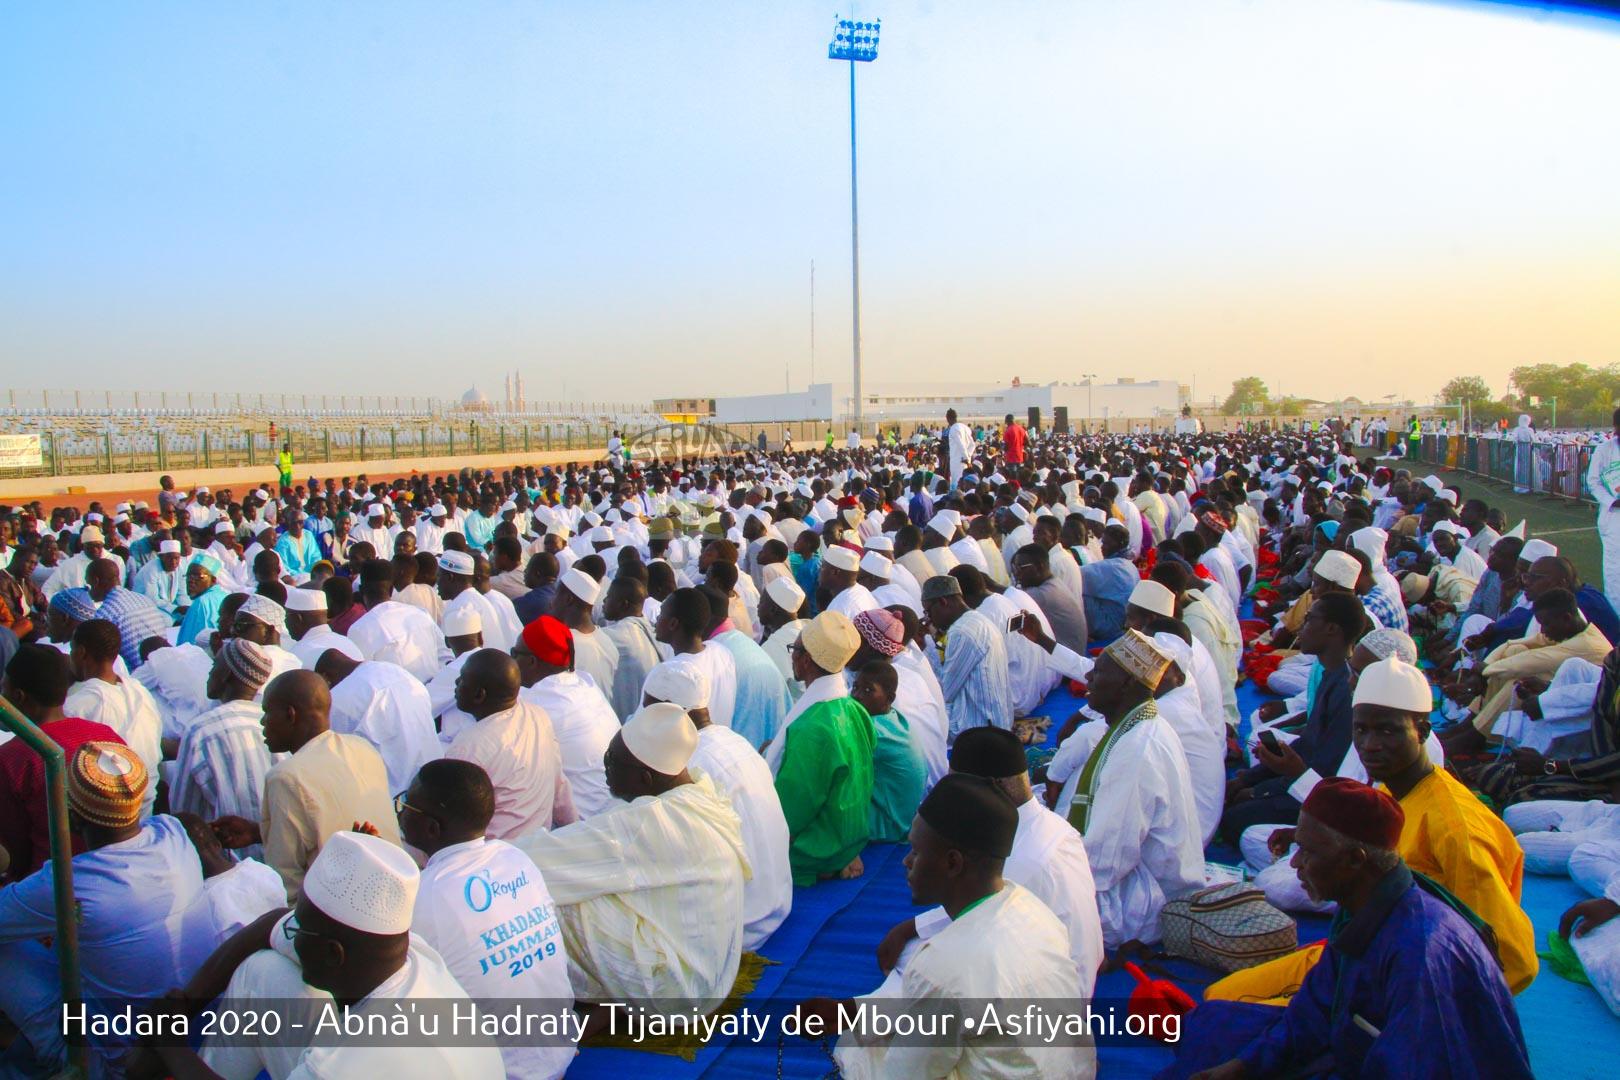 PHOTOS - Les Images de la Hadratoul Djumah  2020  d'Abnà'u Hadraty Tijaniyaty de Mbour